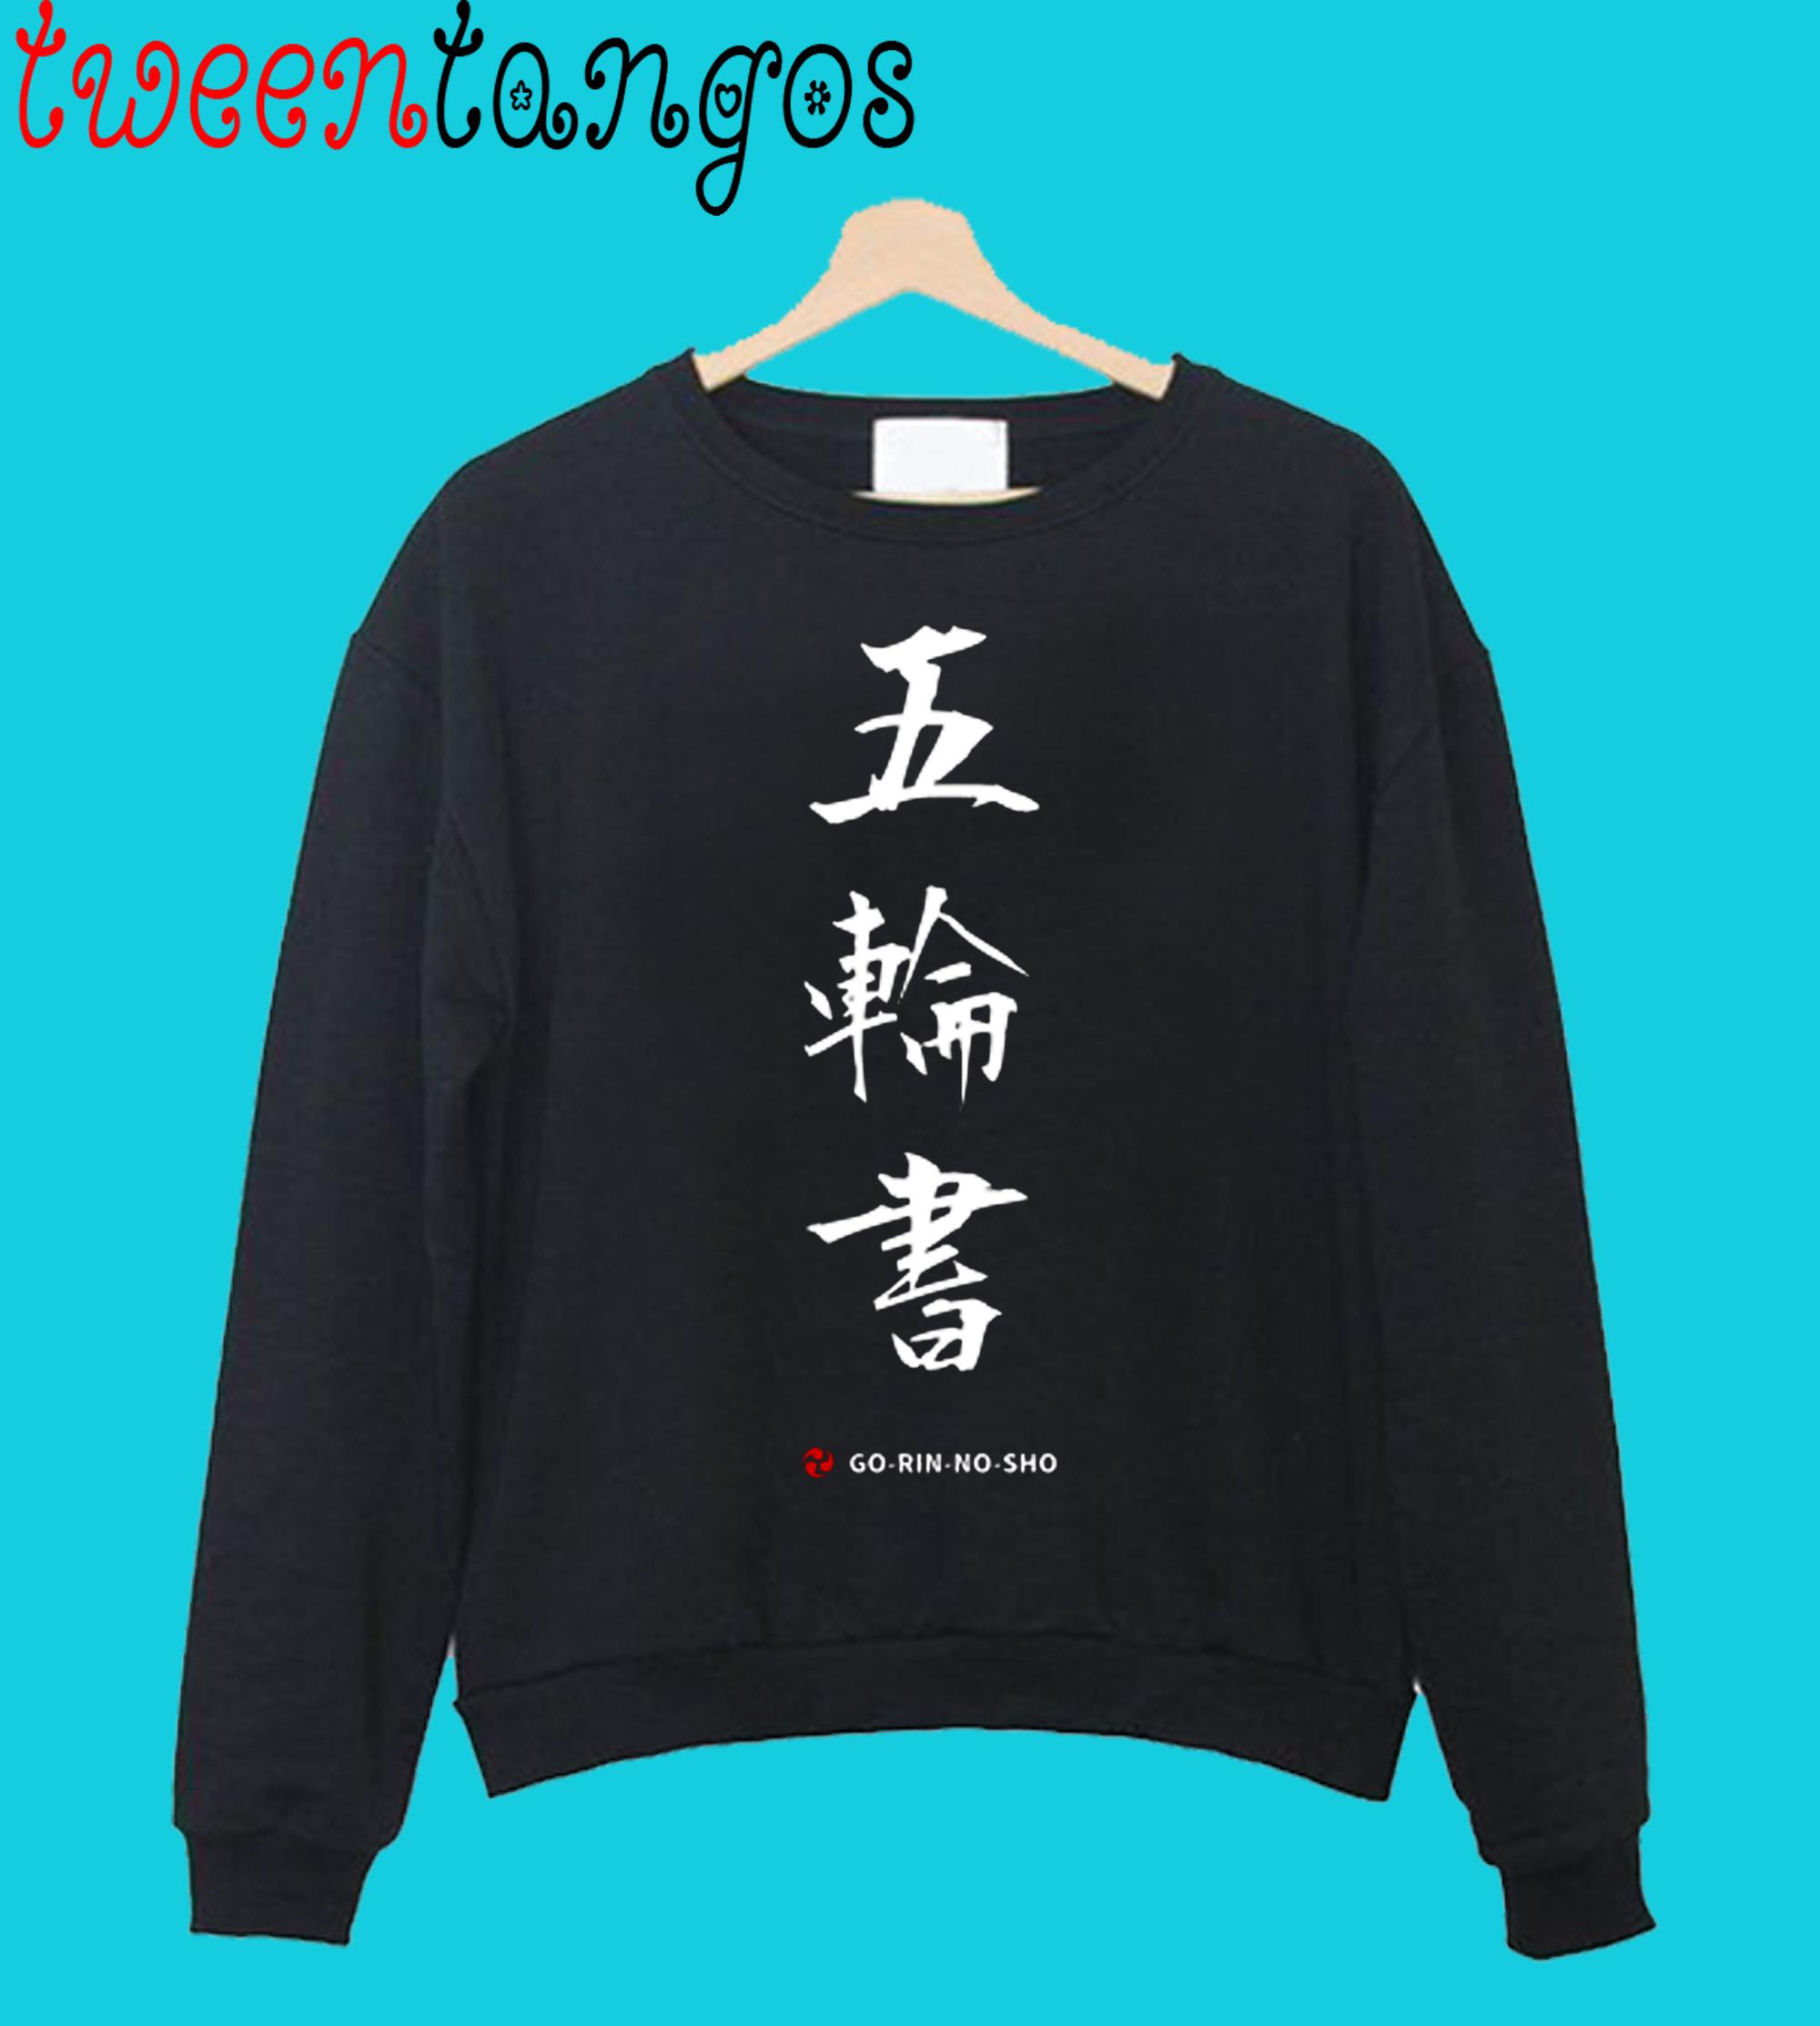 The Book of Five Rings (GO RIN NO SHO) MIYAMOTO MUSASHI Crewneck Sweatshirt